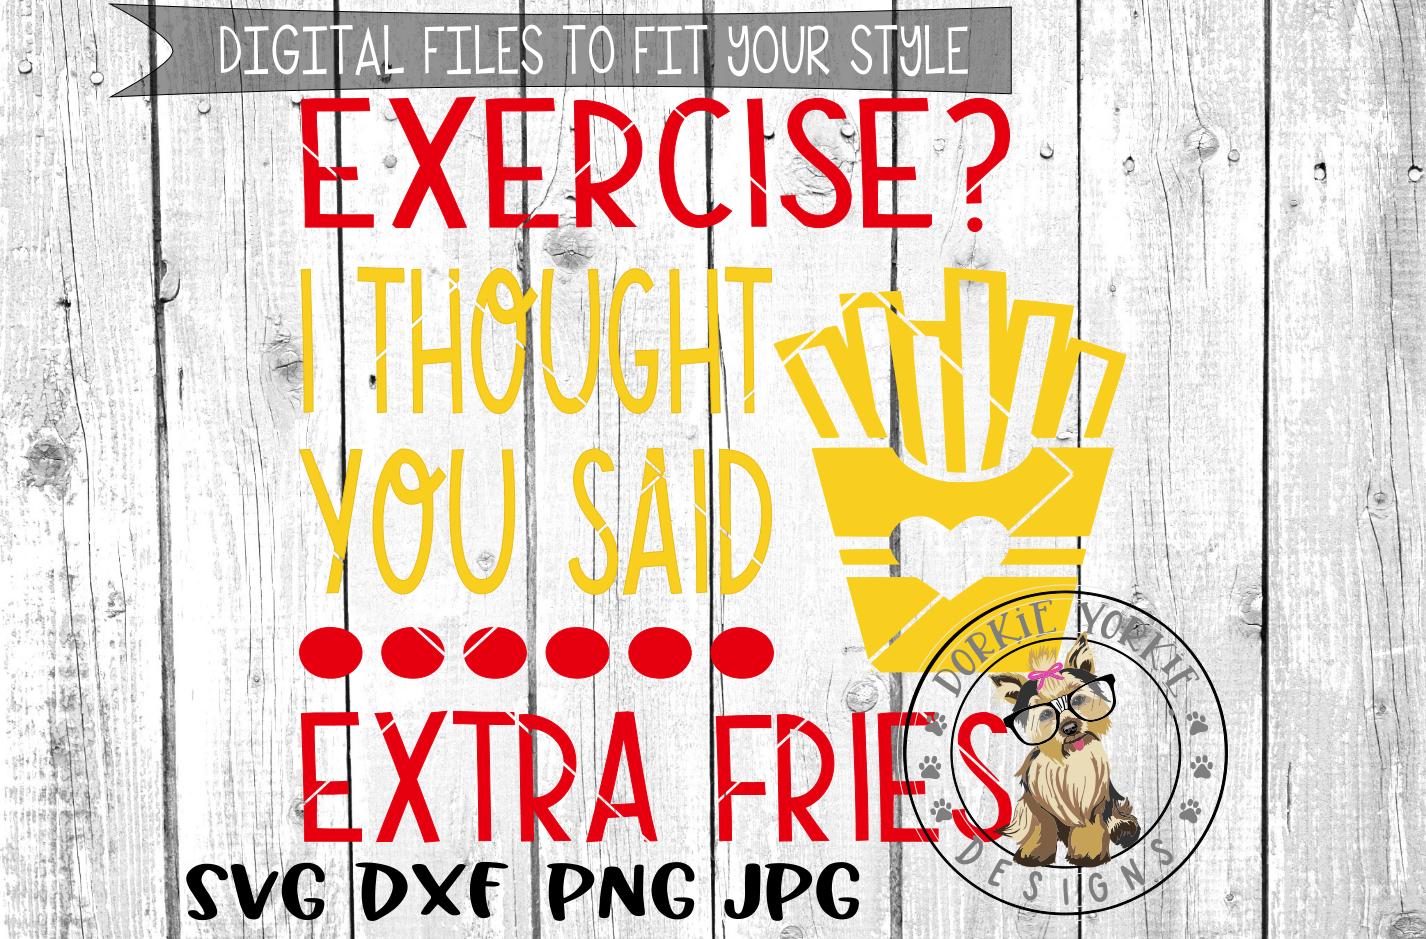 I work out, just kidding BUNDLE - Gym, funny, workout - SVG example image 10